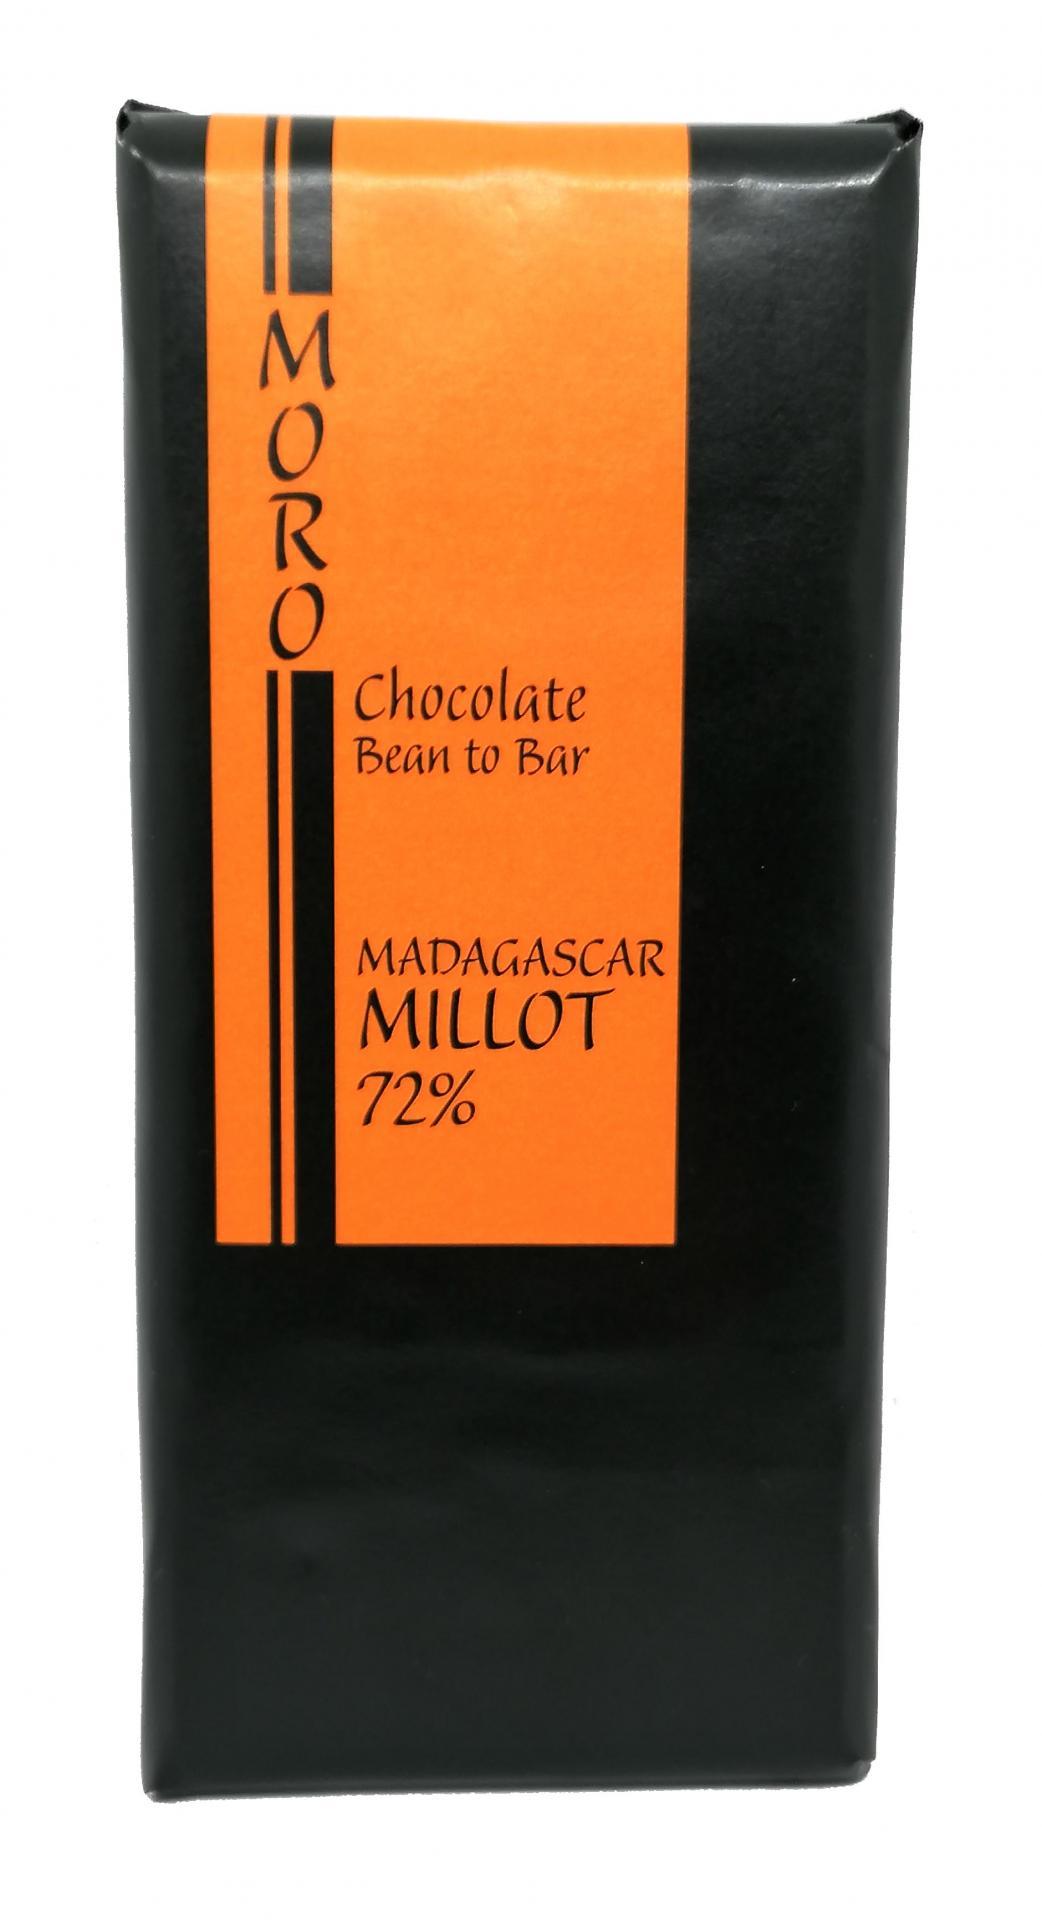 Chocolate Madagascar Millot 72%  - Chocolates Moro